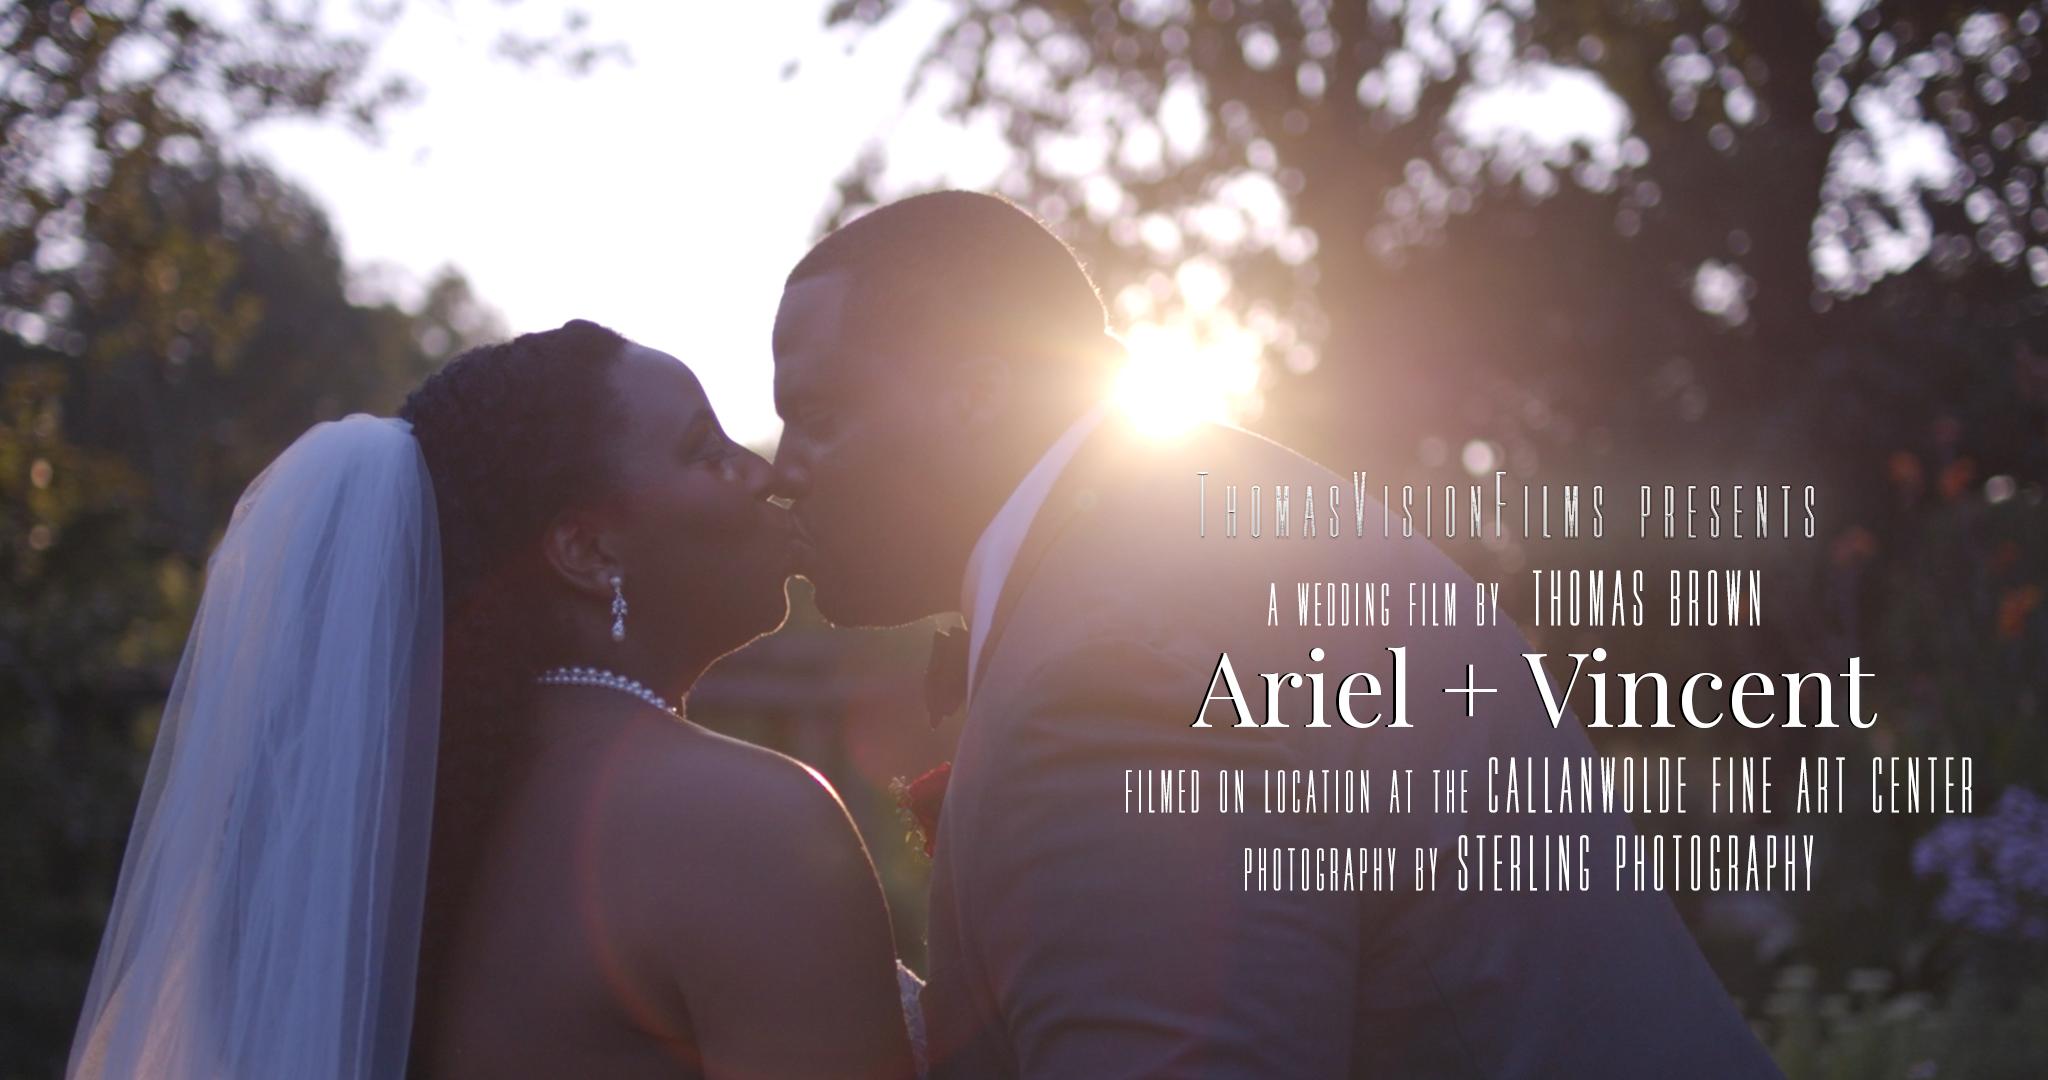 Ariel + Vincent Vimeo Thumb.jpg